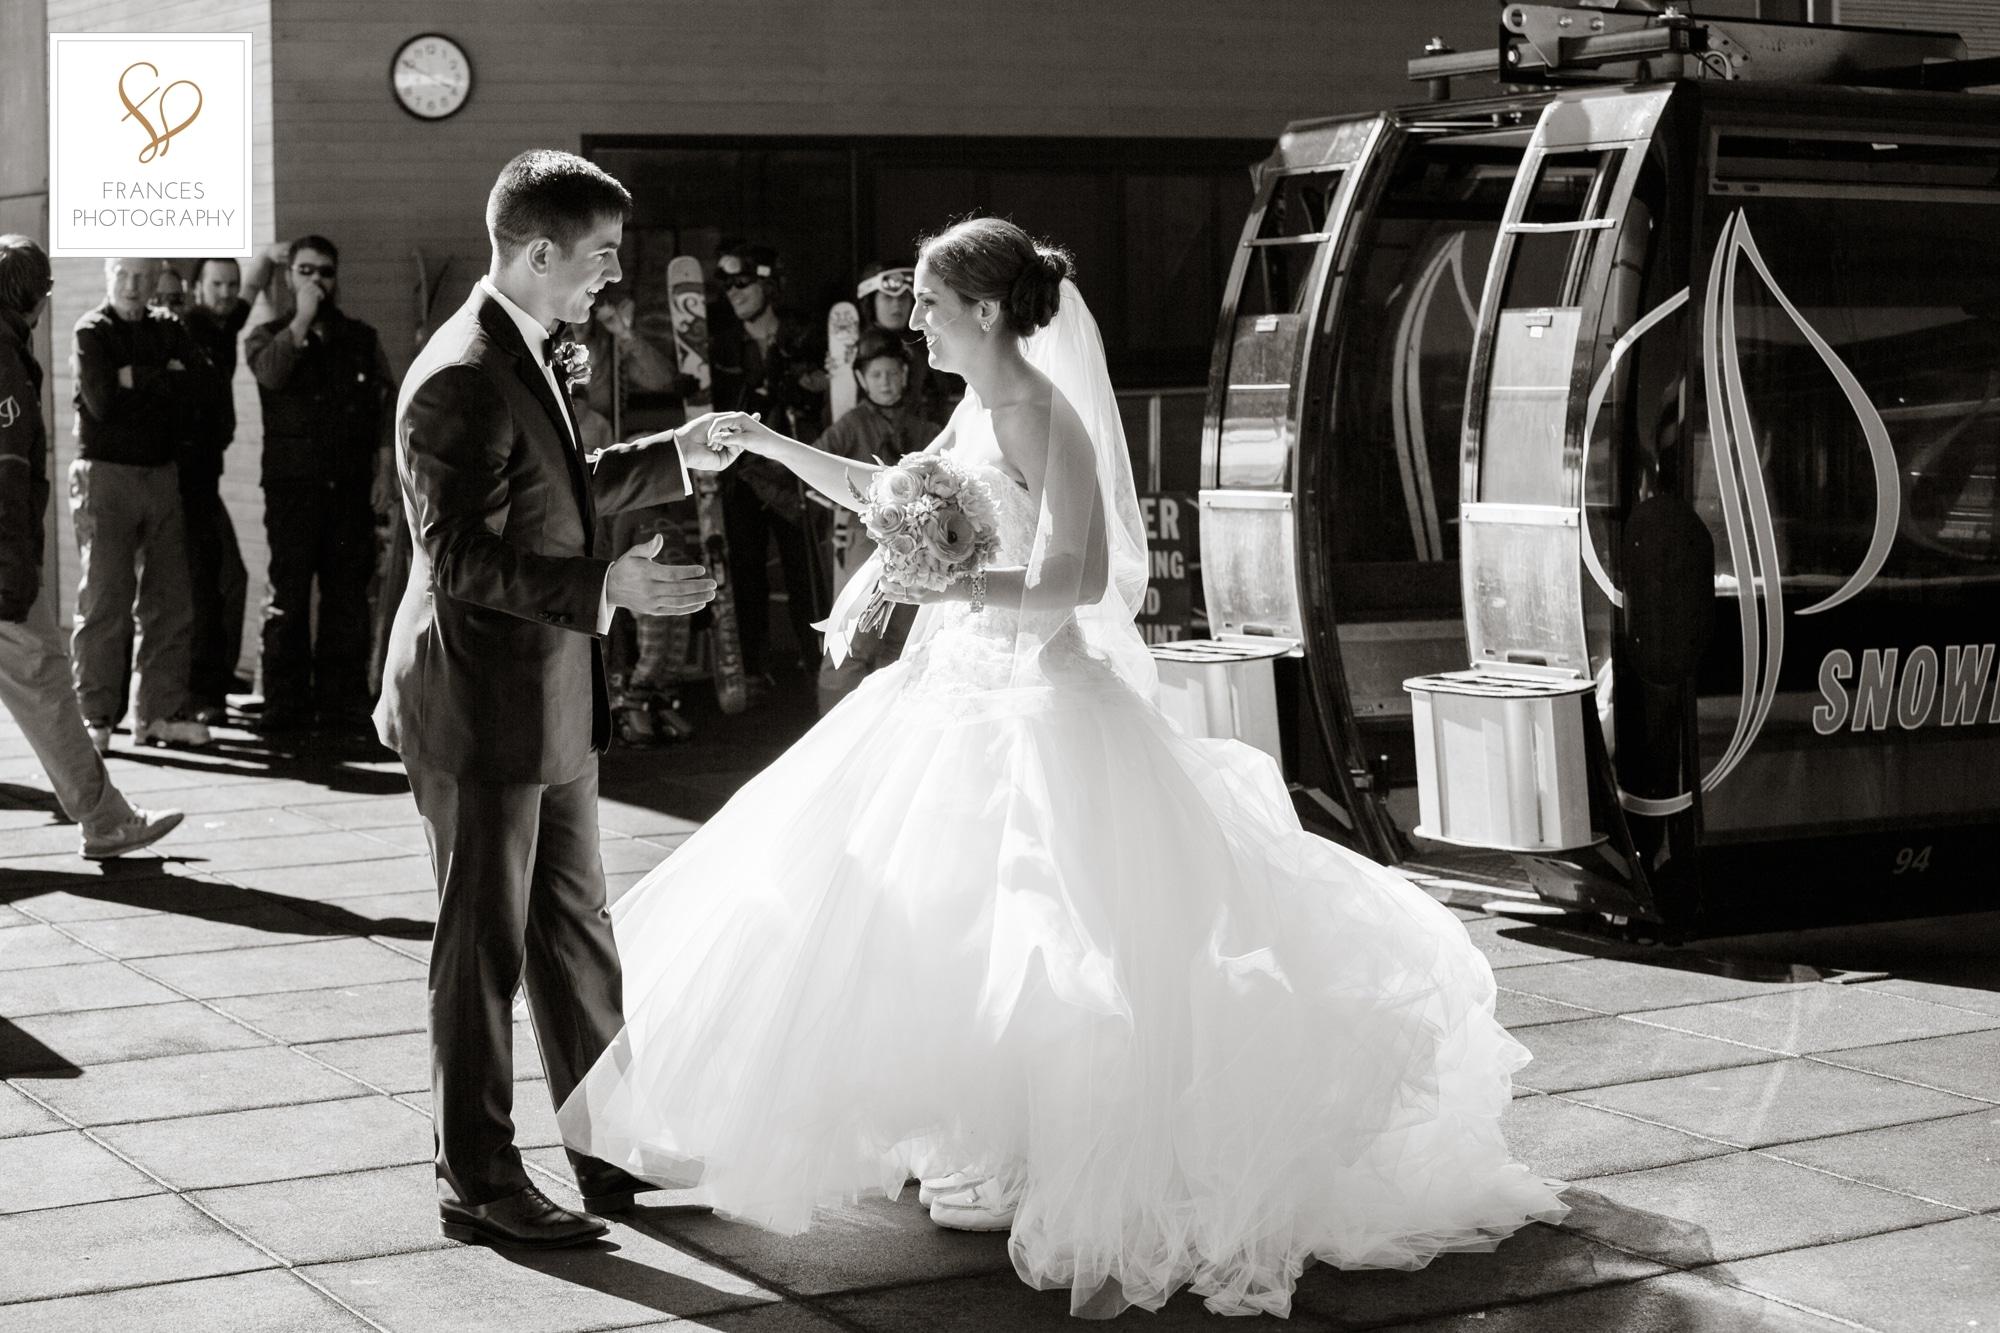 Wedding photo bride groom ski lift